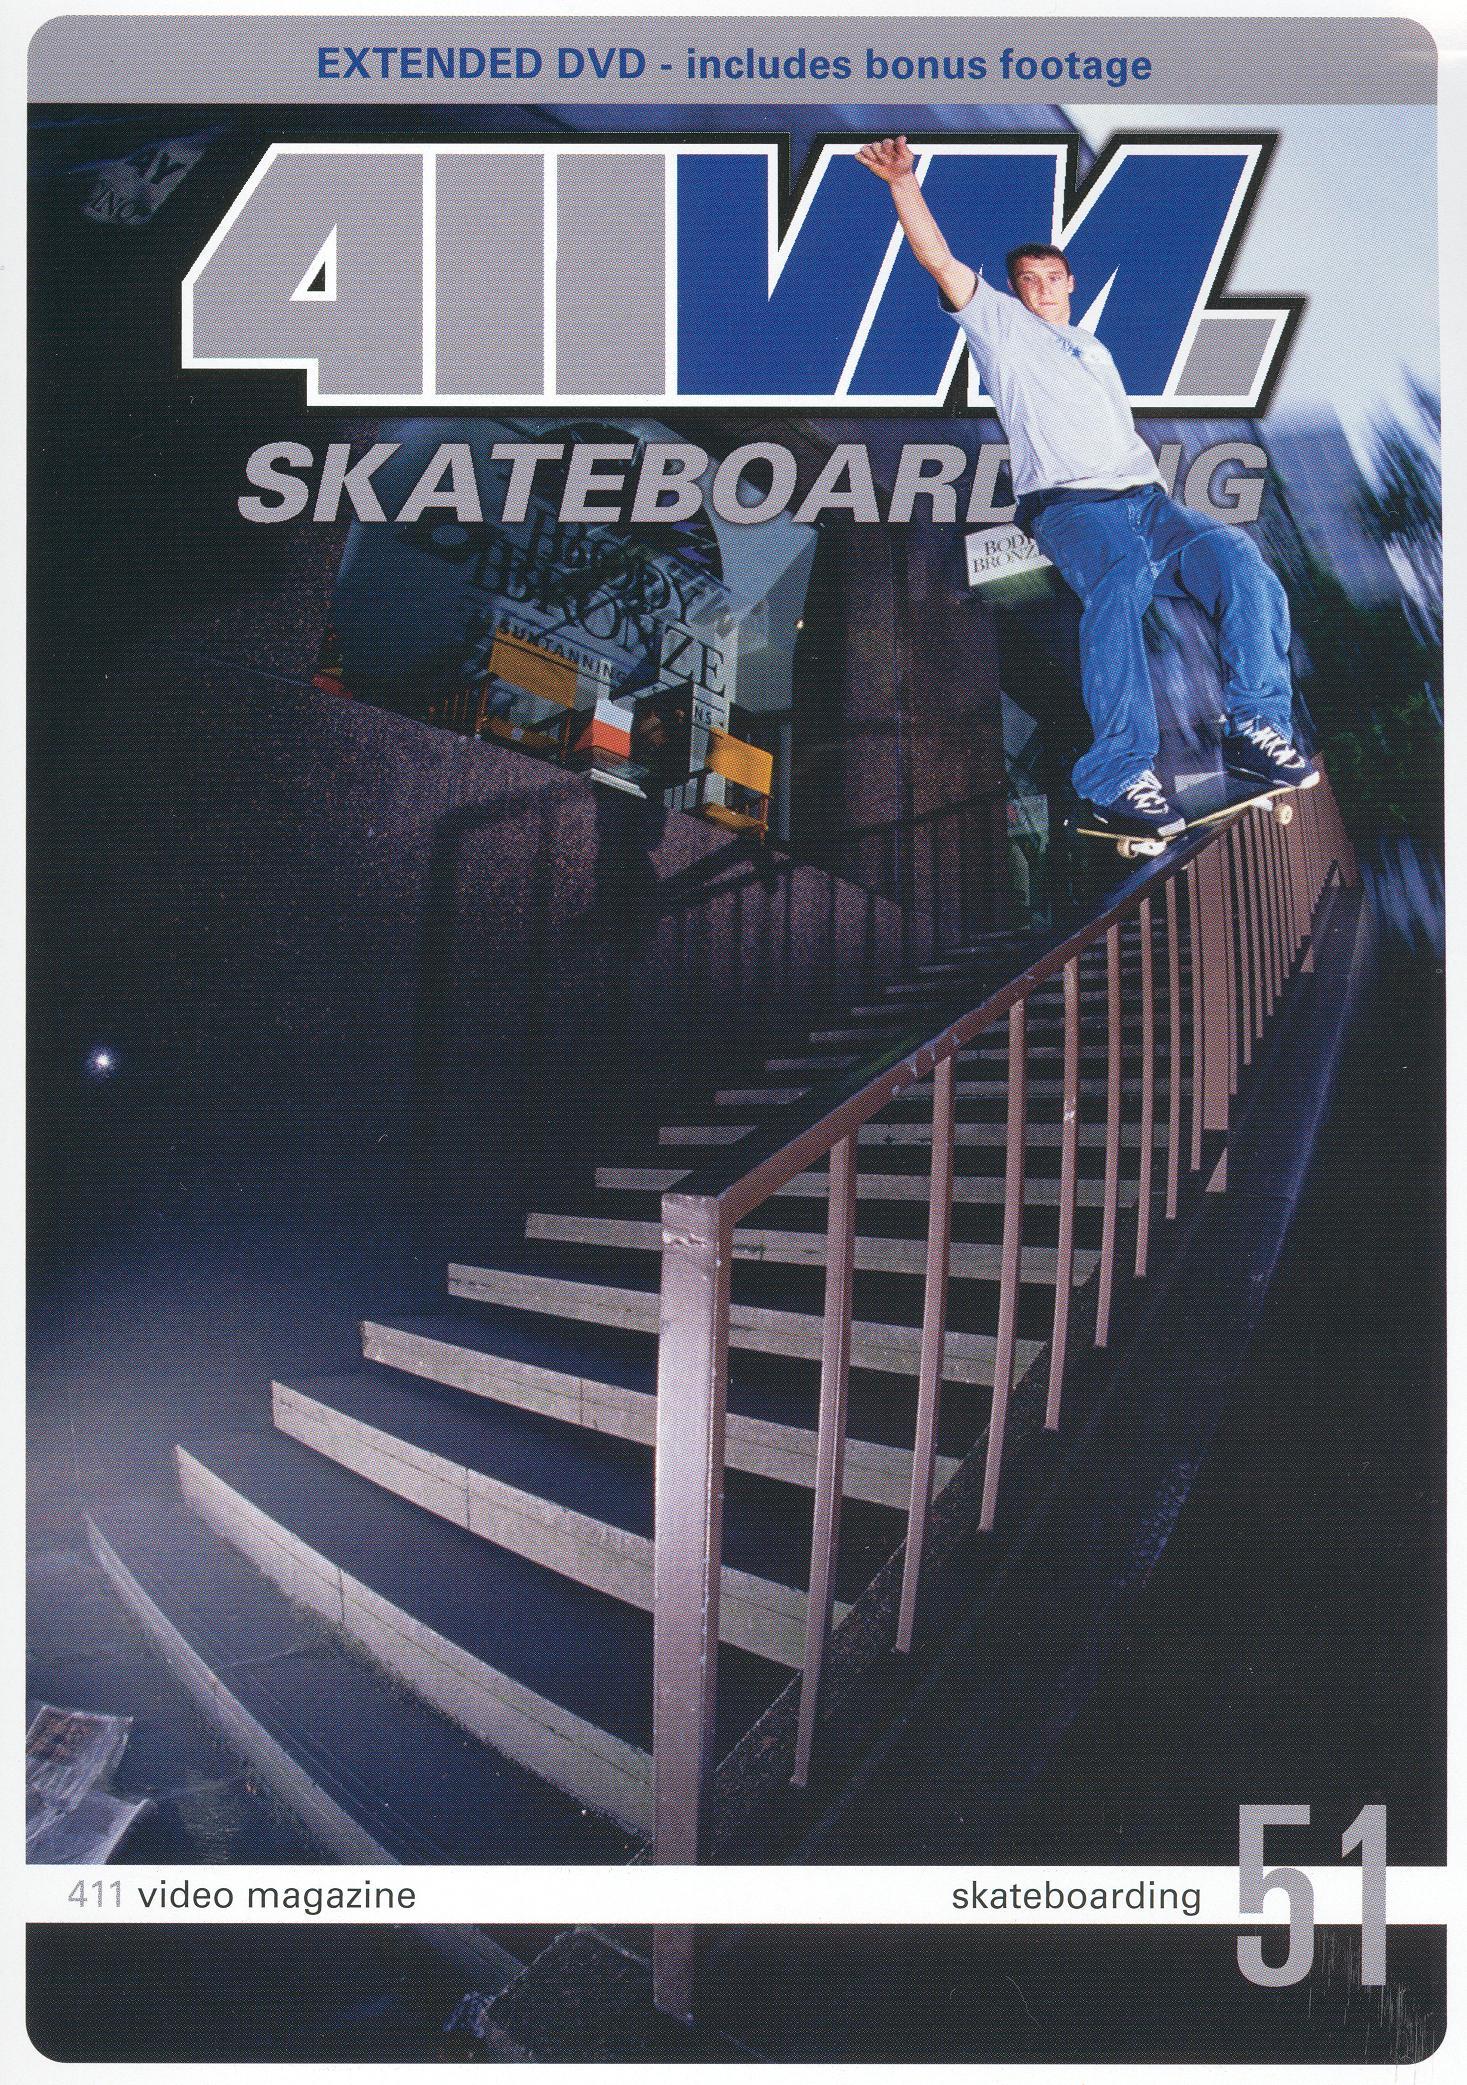 411 Video Magazine: Skateboarding, Vol. 51